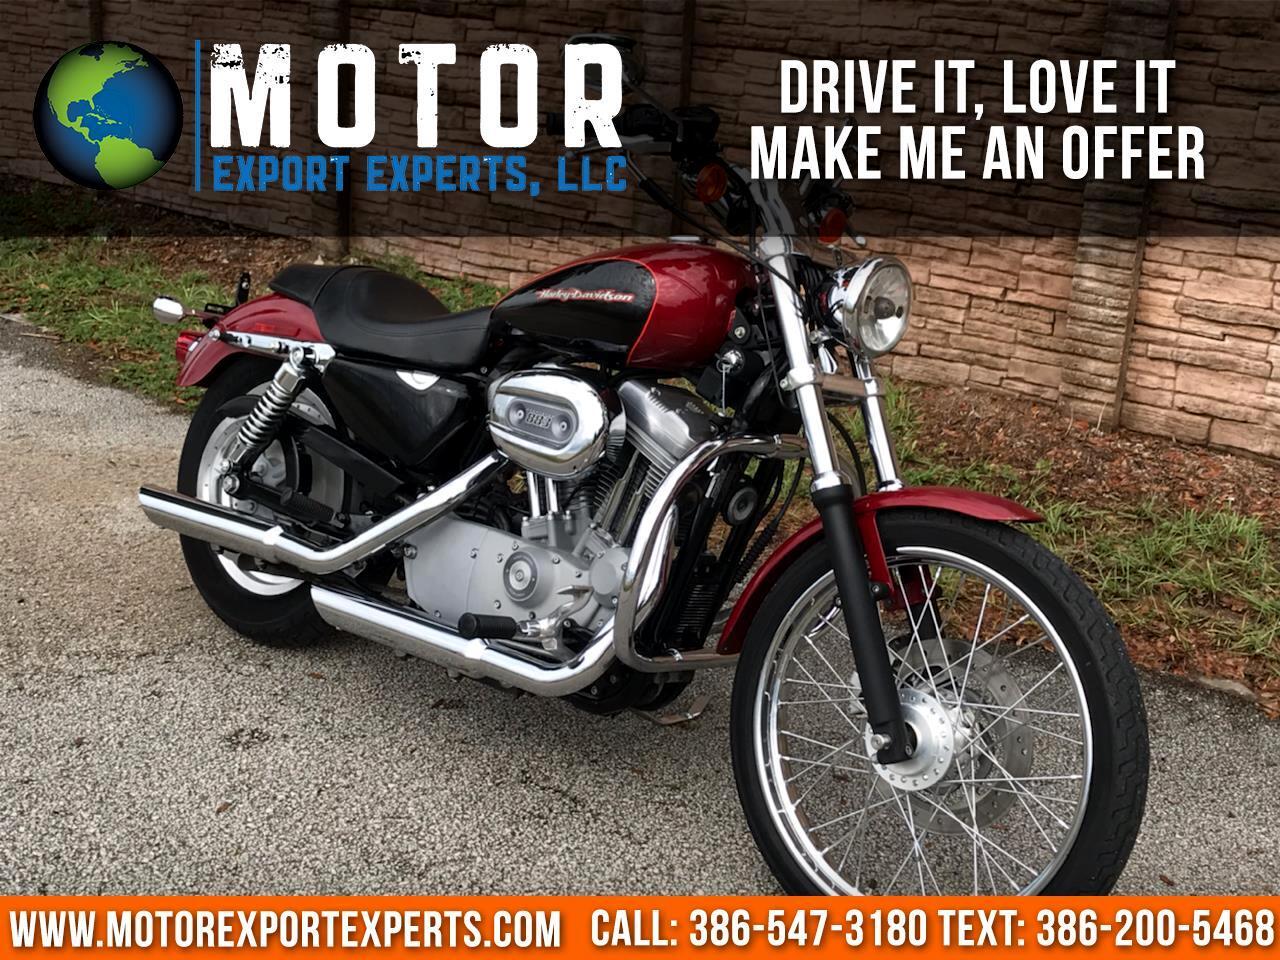 2006 Harley-Davidson XL 883C SPORTSTER